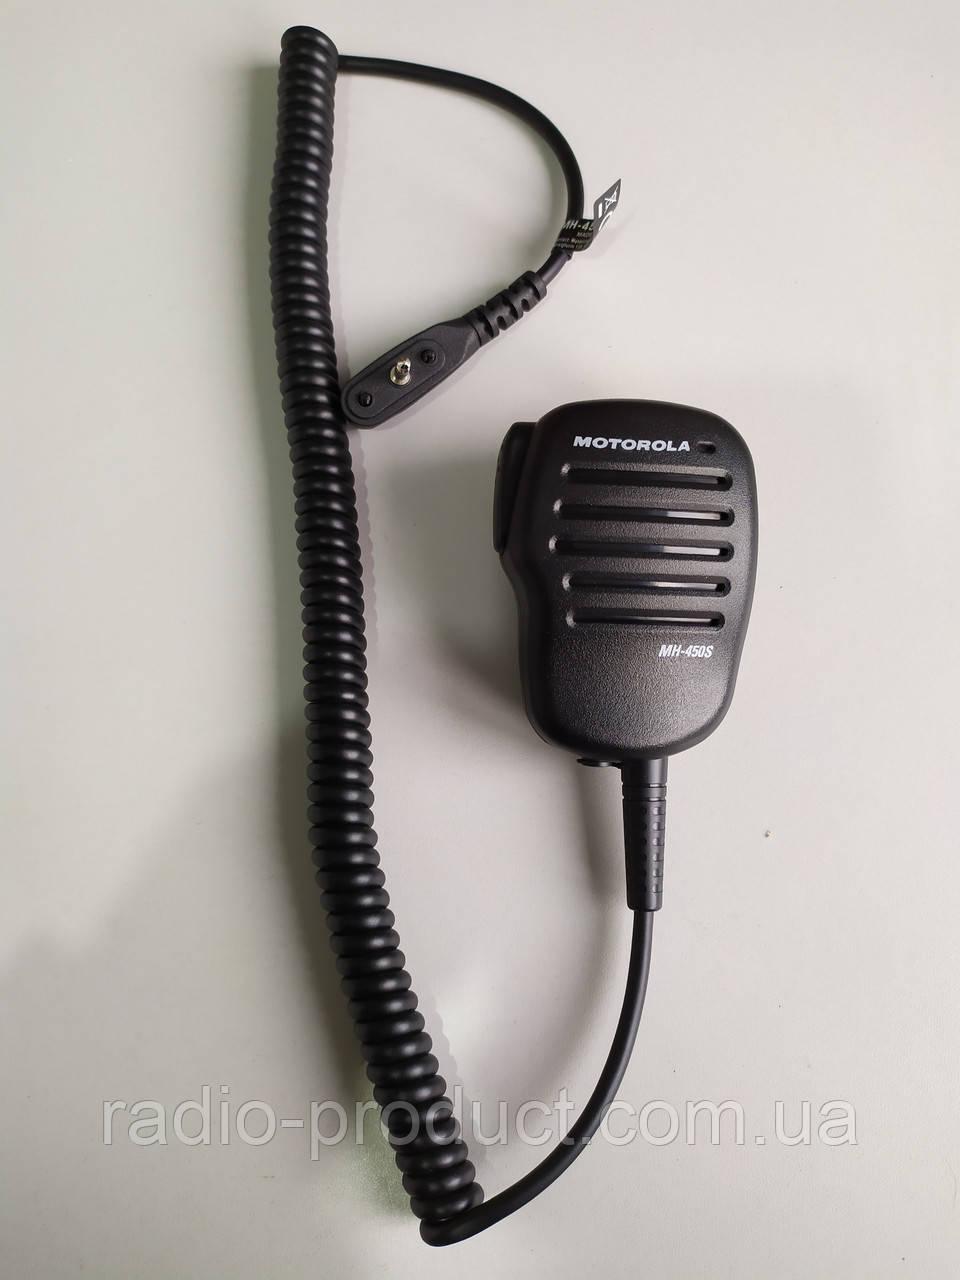 Speaker Micr For Vertex VX231 VX261 EVX261 VX264 VX354 VX454 VX459 Portable